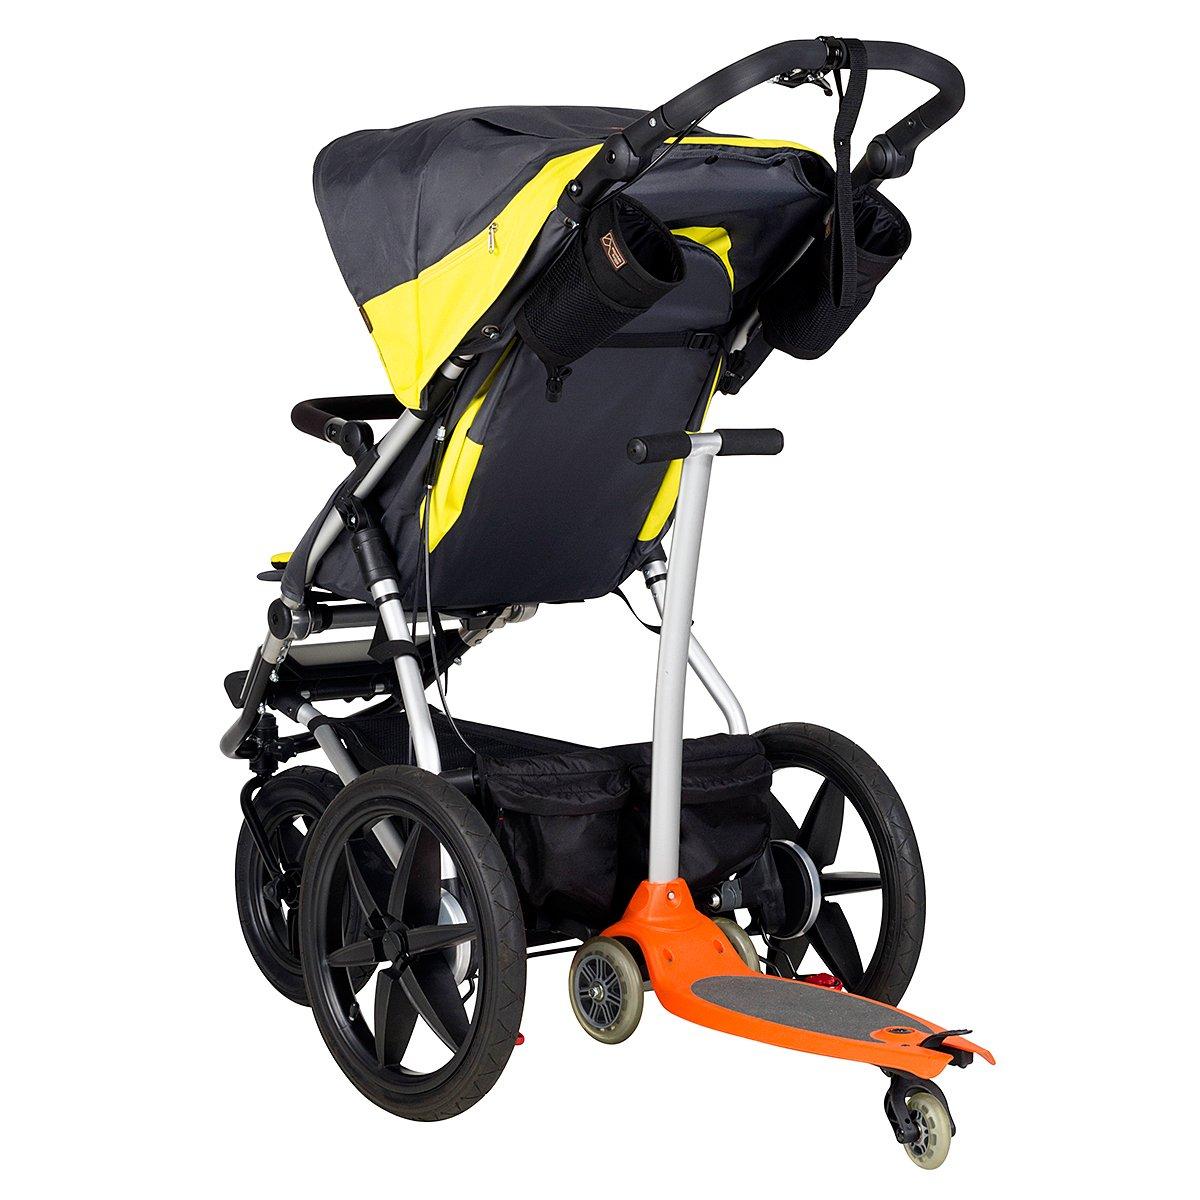 Mountain Buggy Terrain Premium Jogging Stroller, Graphite by Mountain Buggy (Image #10)